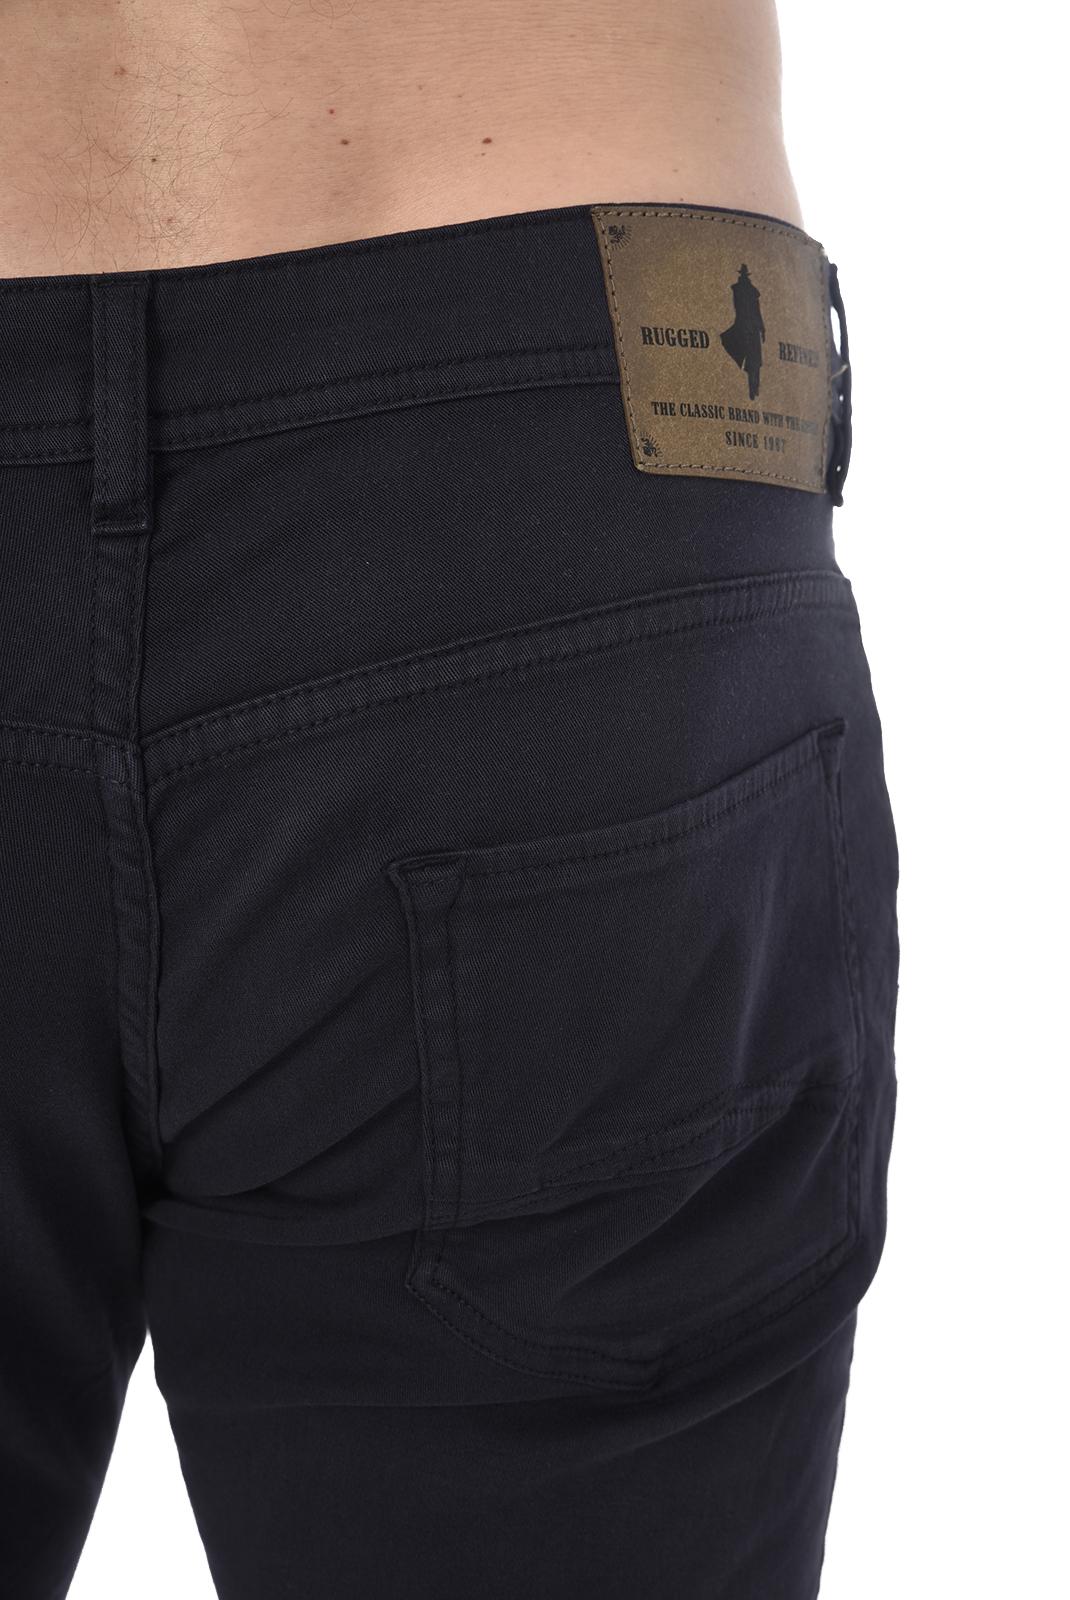 Pantalons chino/citadin  Marlboro classic MMM0101Z00 760 BLEU